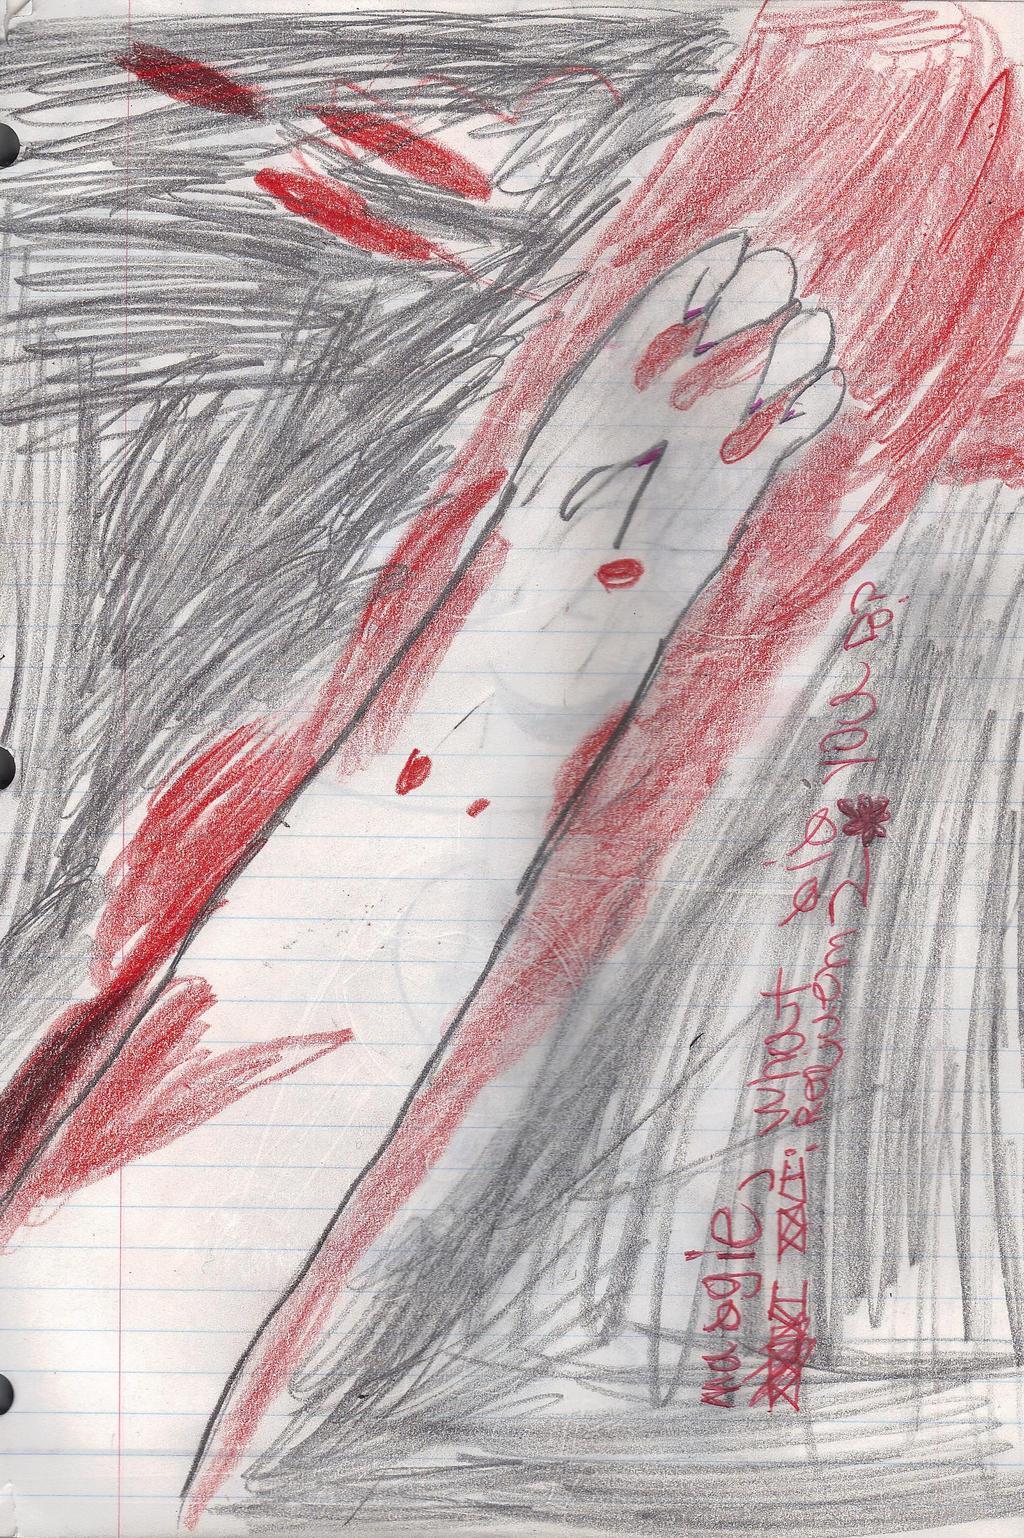 Book Cover for Madgie, what did you do XXVI by AkaiChounokoe